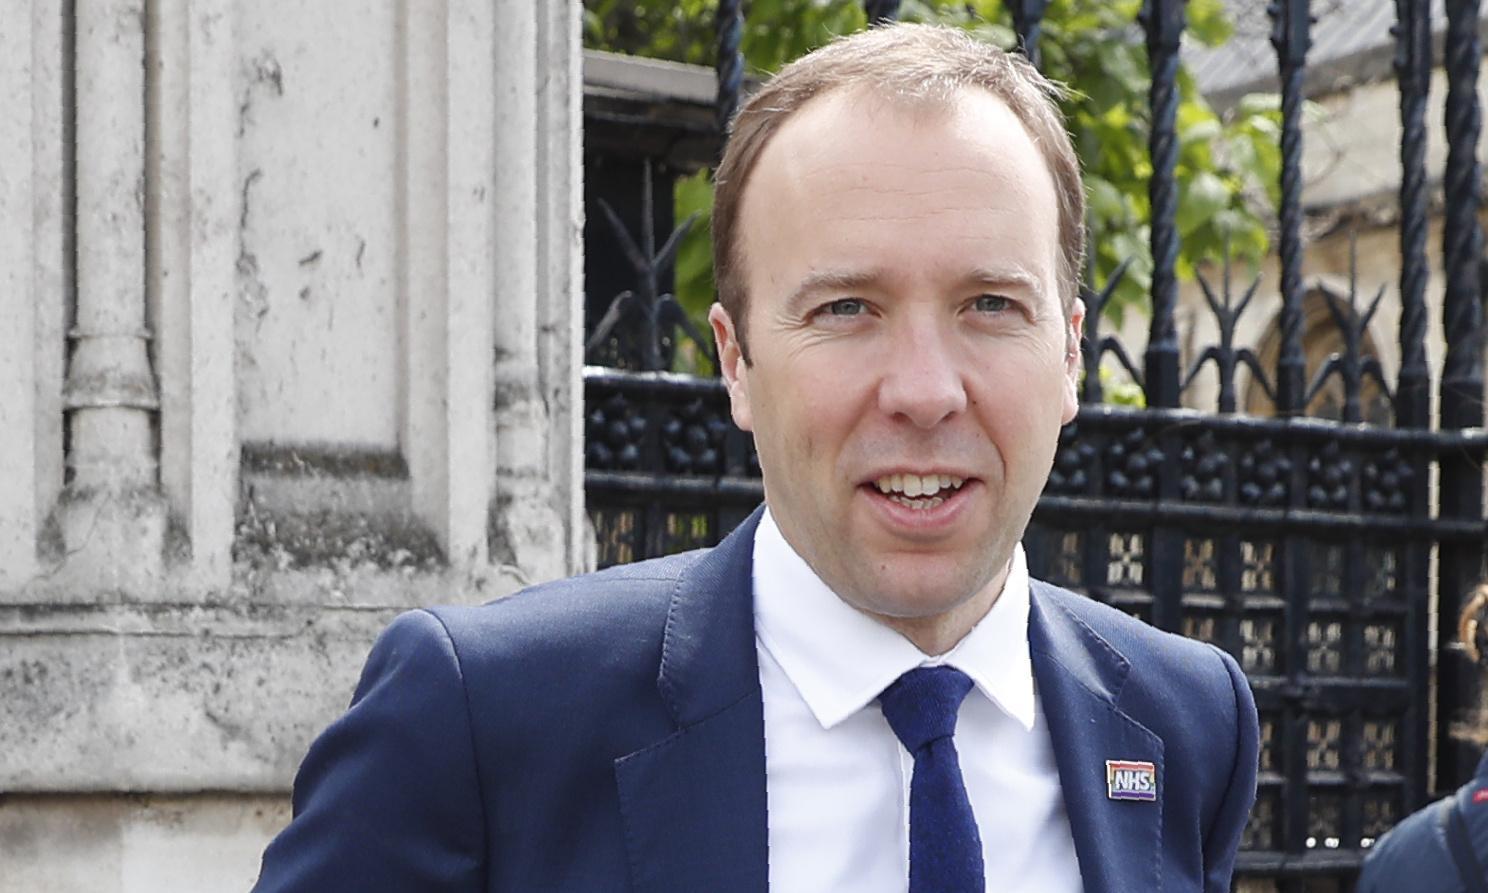 Matt Hancock backs Boris Johnson in Tory leadership race